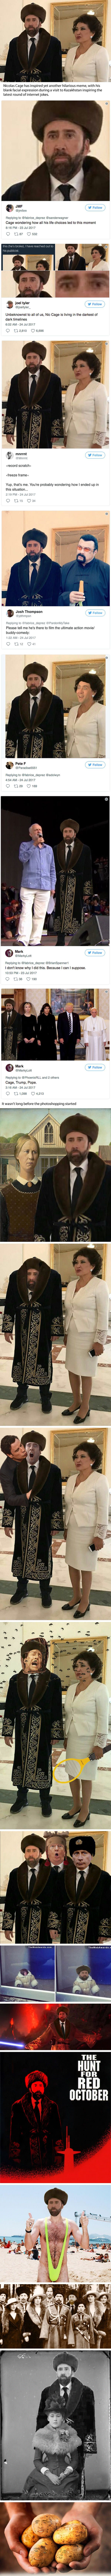 Nicolas Cage's Kazakhstan Outfit Made Him An Internet Meme Again